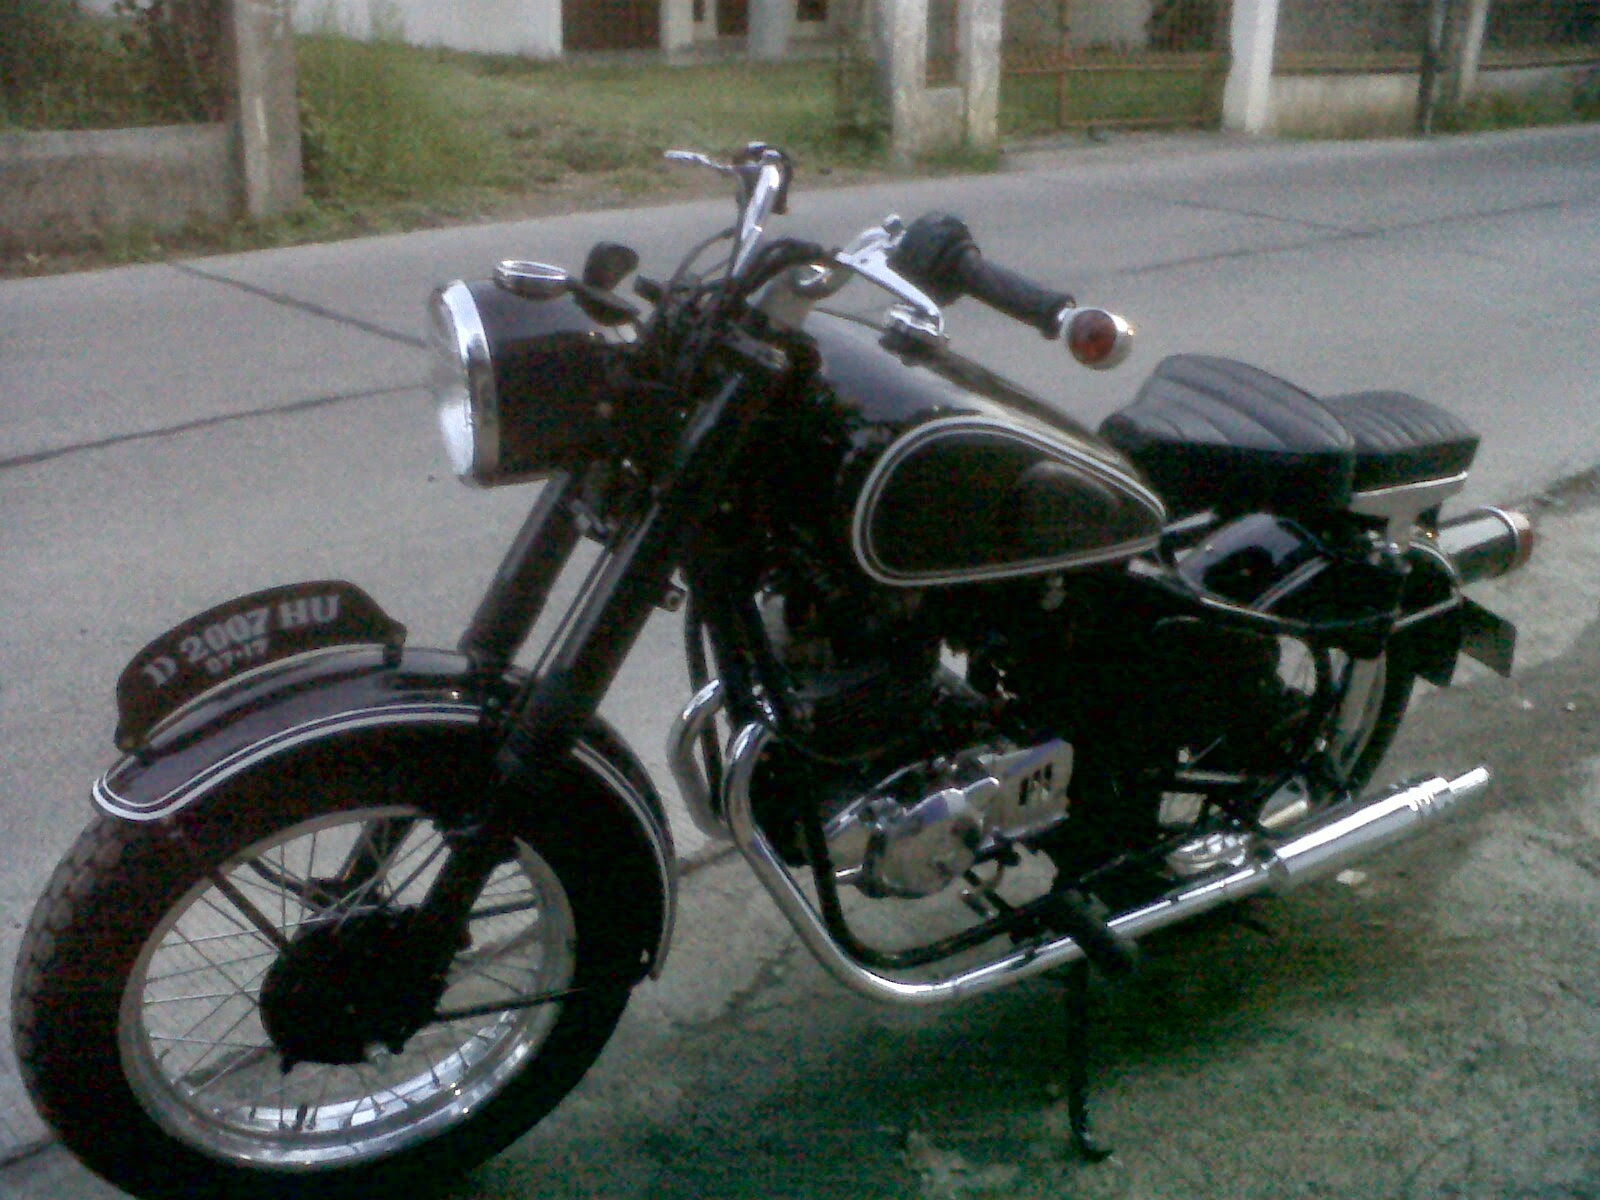 Modifikasi Suzuki Thunder Modifikasi Sepeda Motor